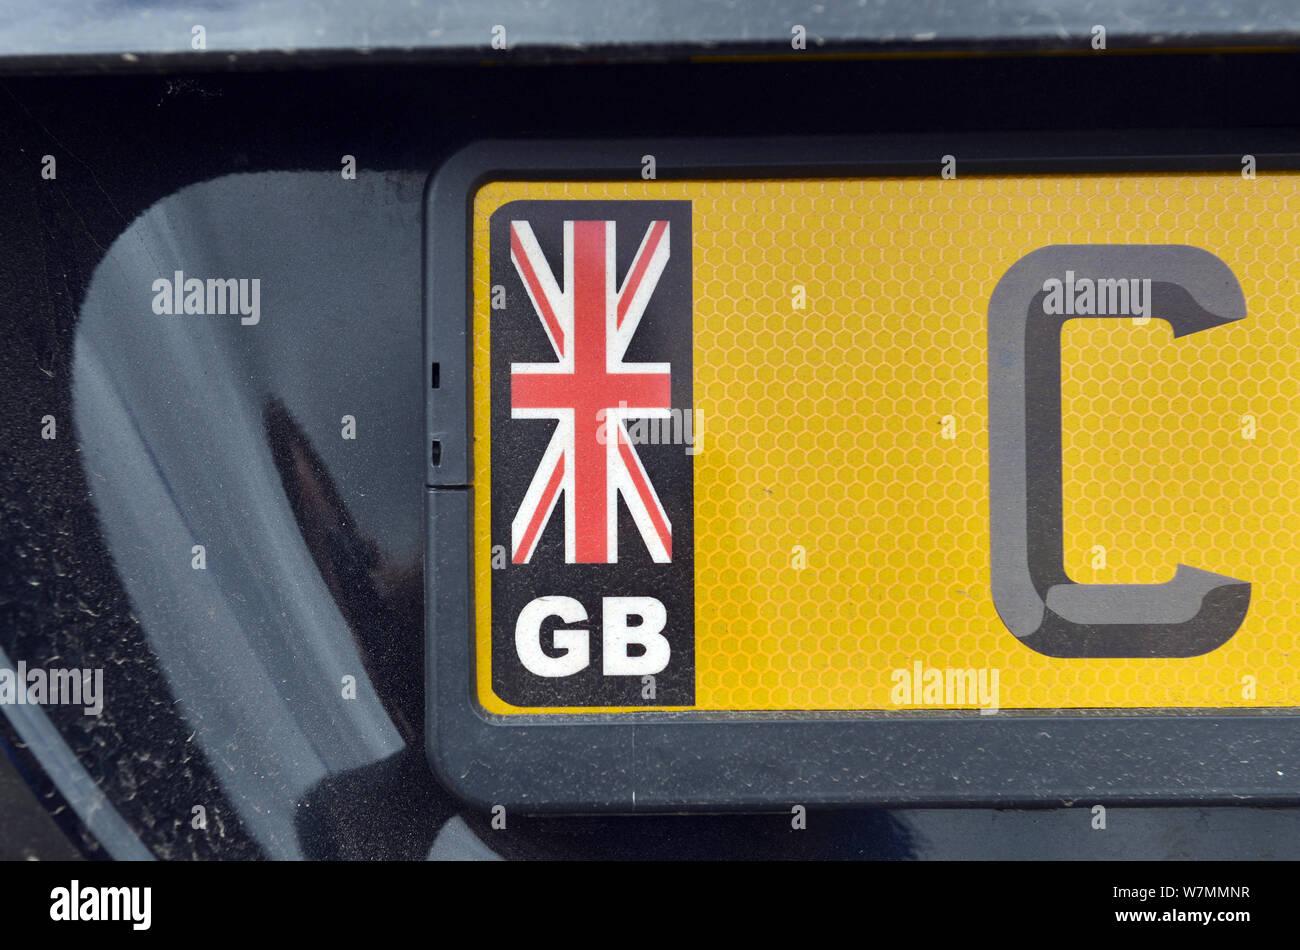 GREAT BRITAIN GB mini cooper custom euro plate jaguar bently cherish